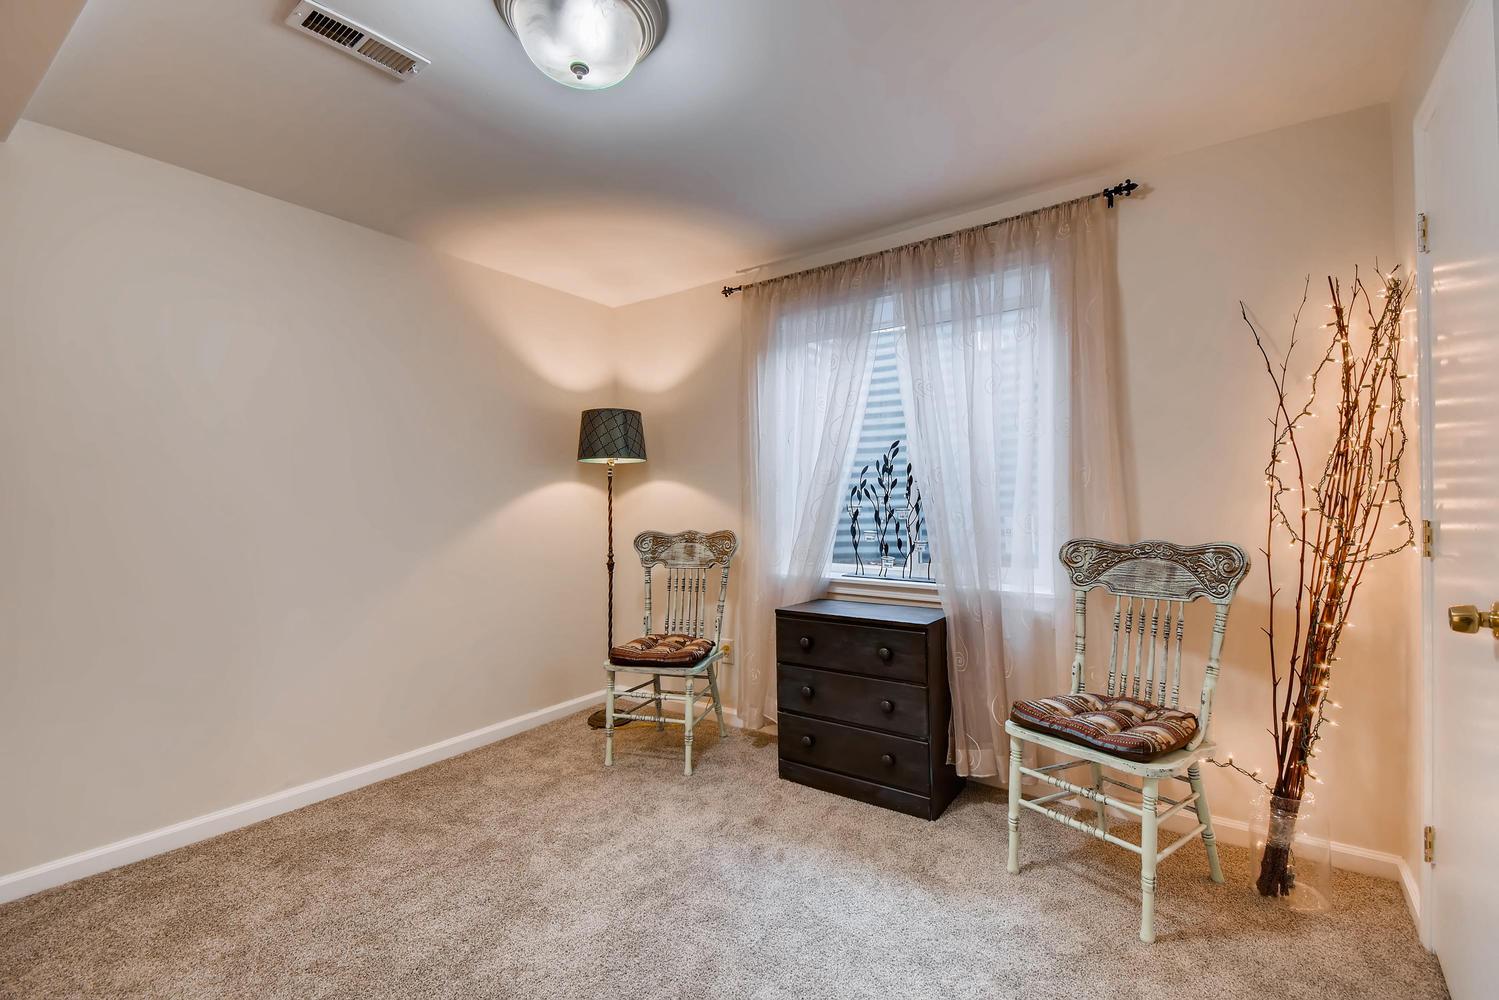 472 Owl Dr Louisville CO 80027-large-019-16-Lower Level Bedroom-1499x1000-72dpi.jpg